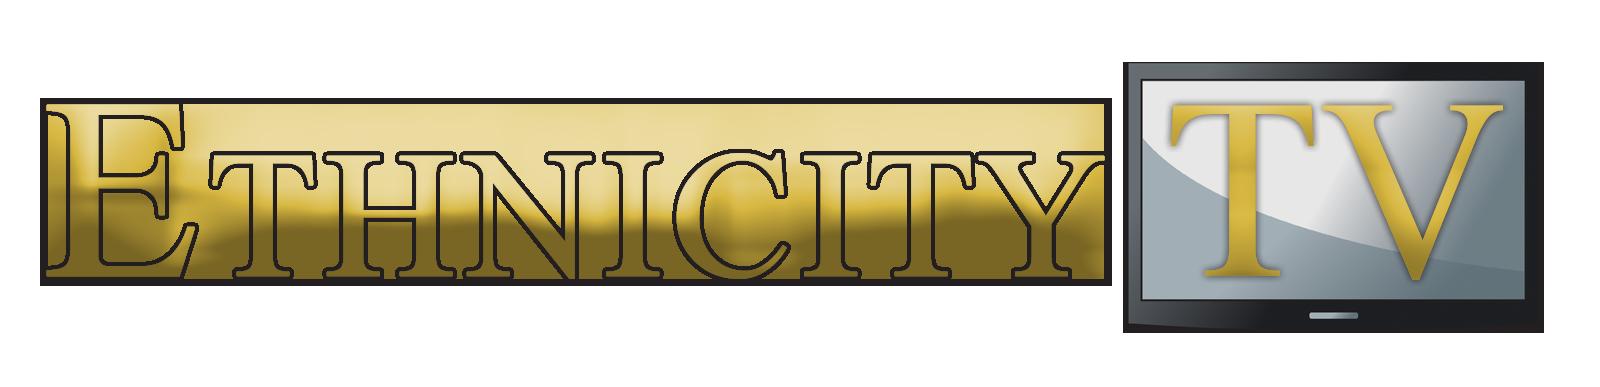 Ethnicity TV